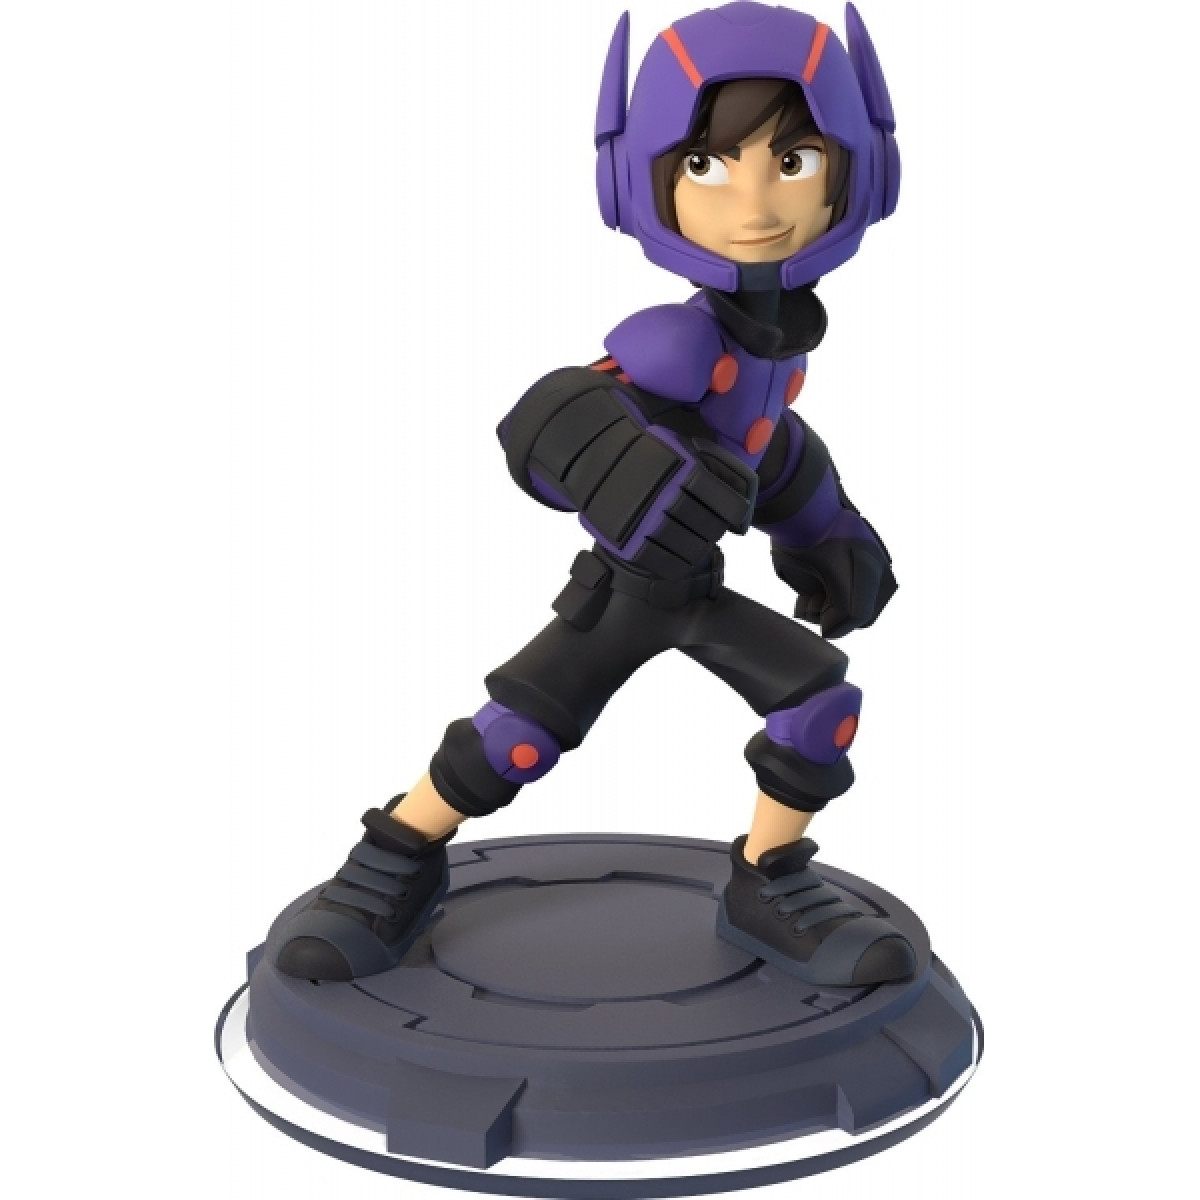 Disney Infinity 2.0 - Hiro játékfigura